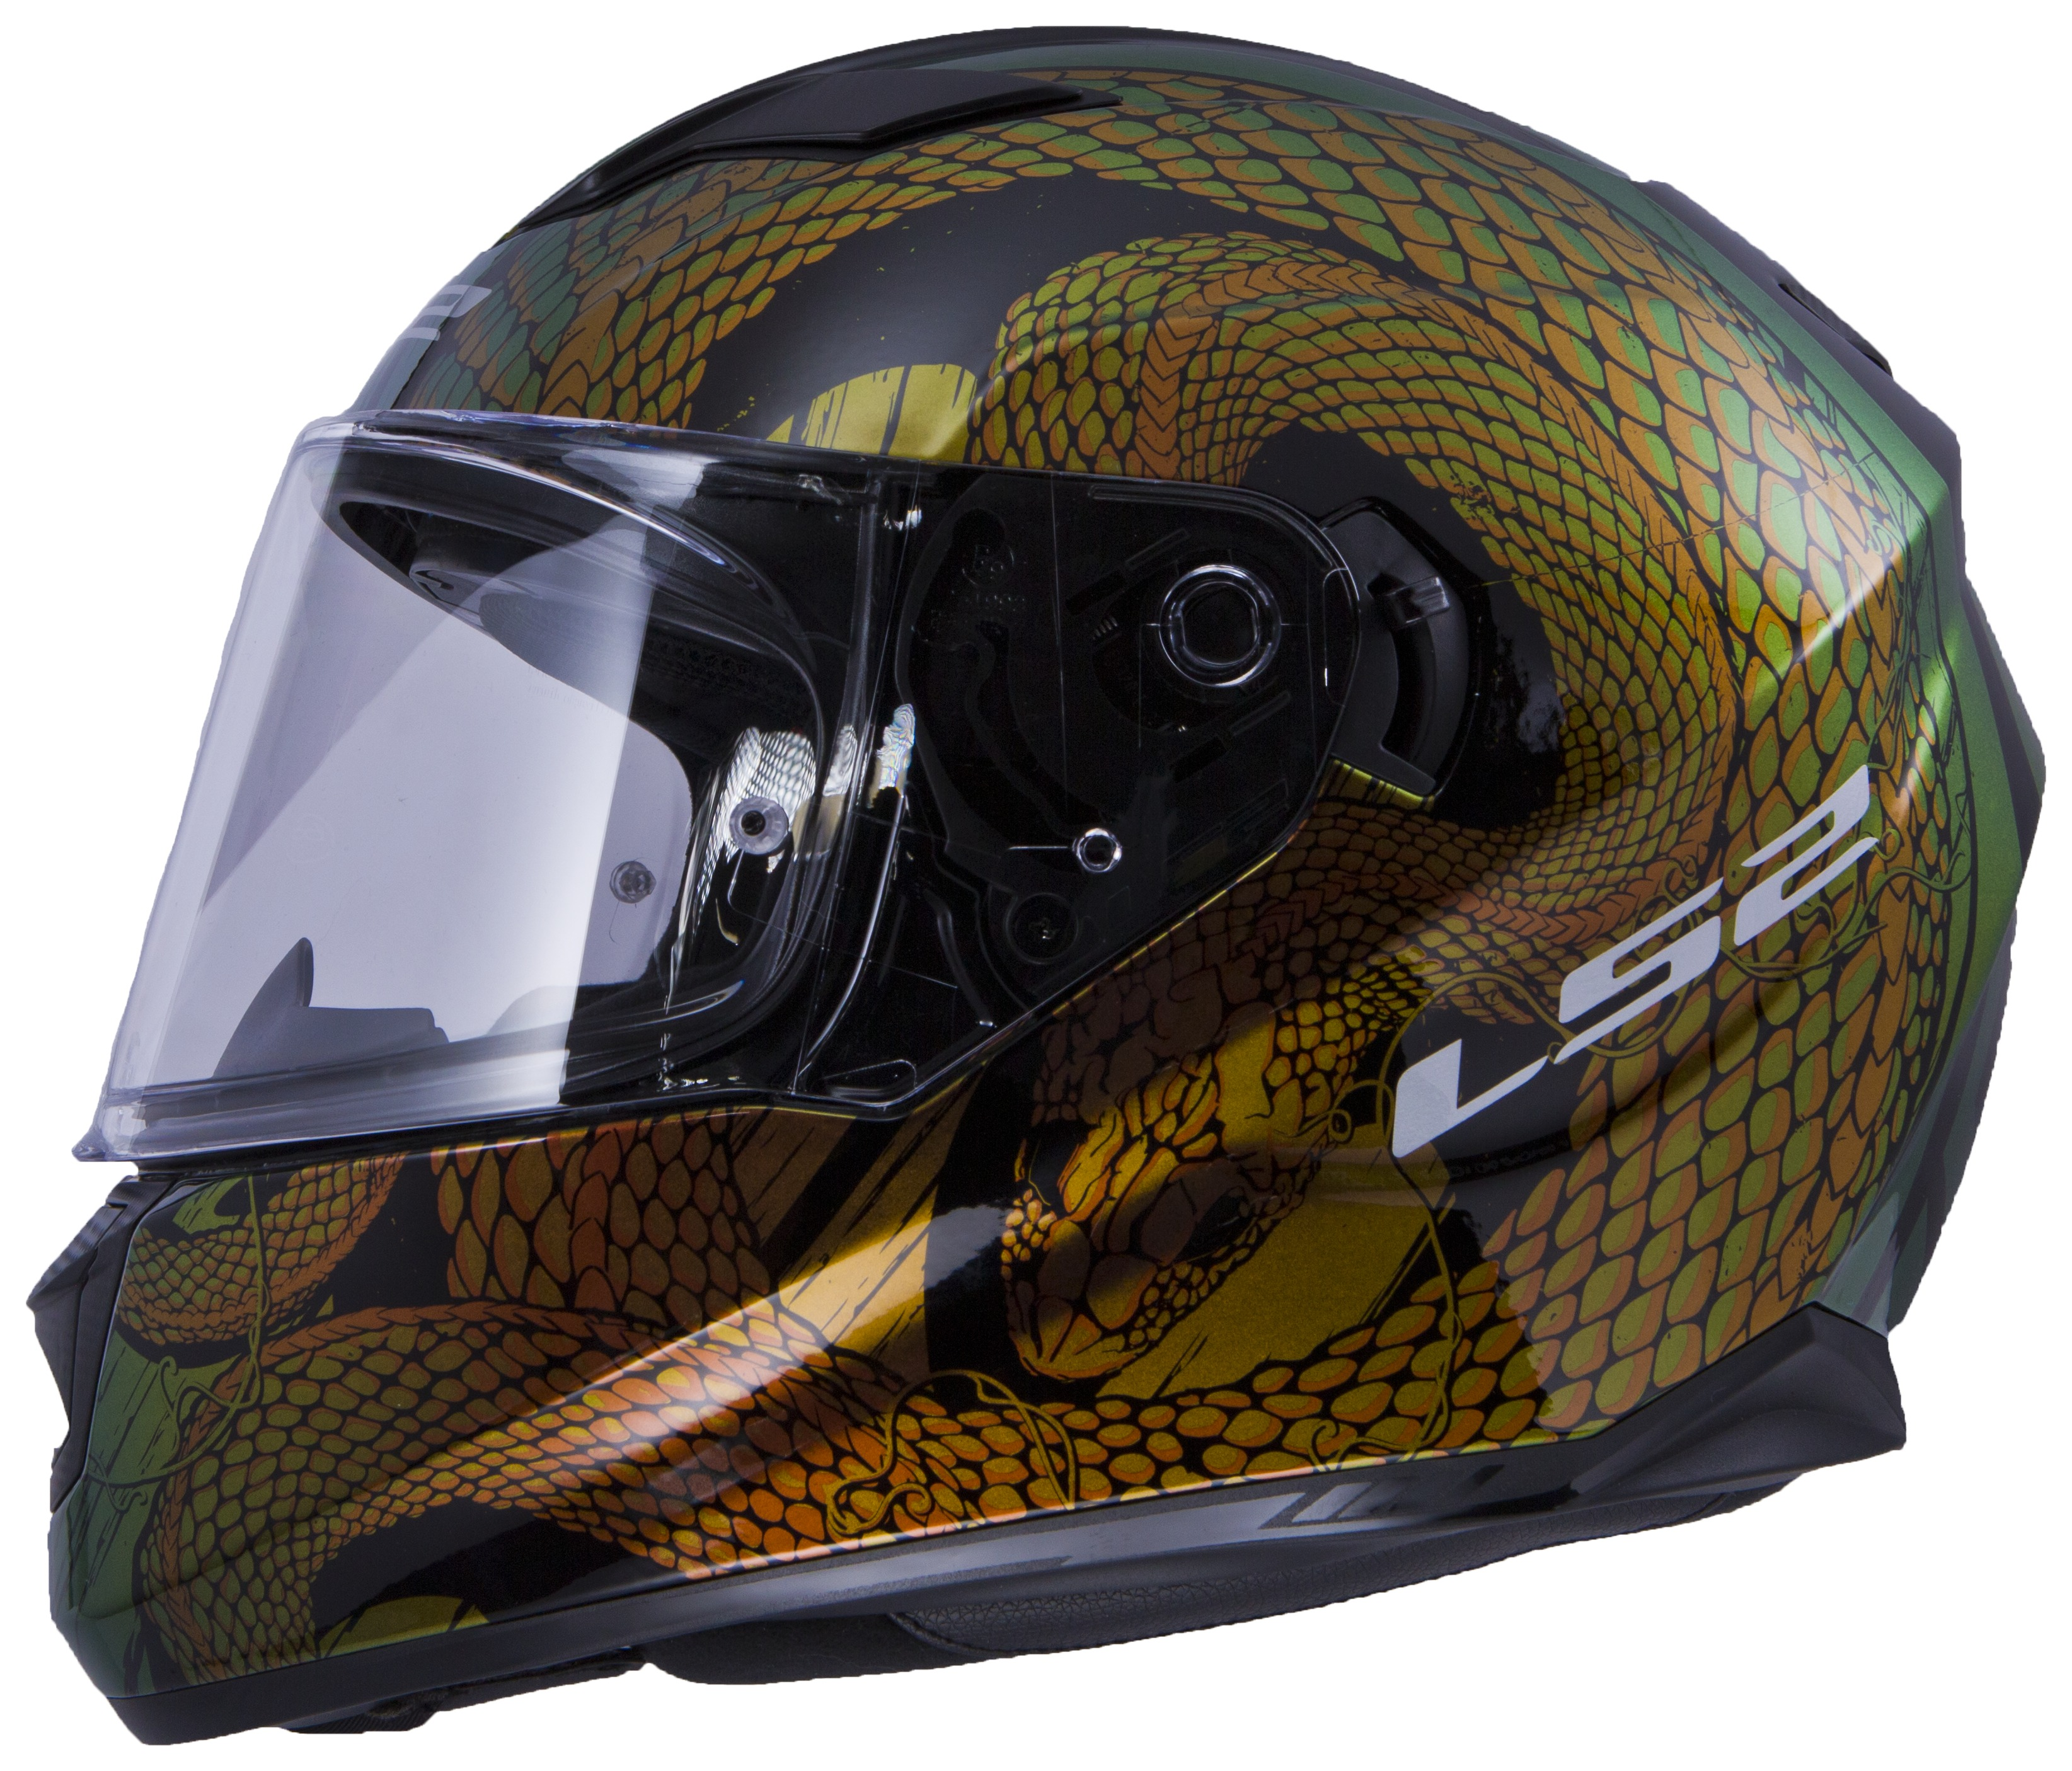 Bell Full Face Helmet >> LS2 Stream Snake Helmet - Cycle Gear